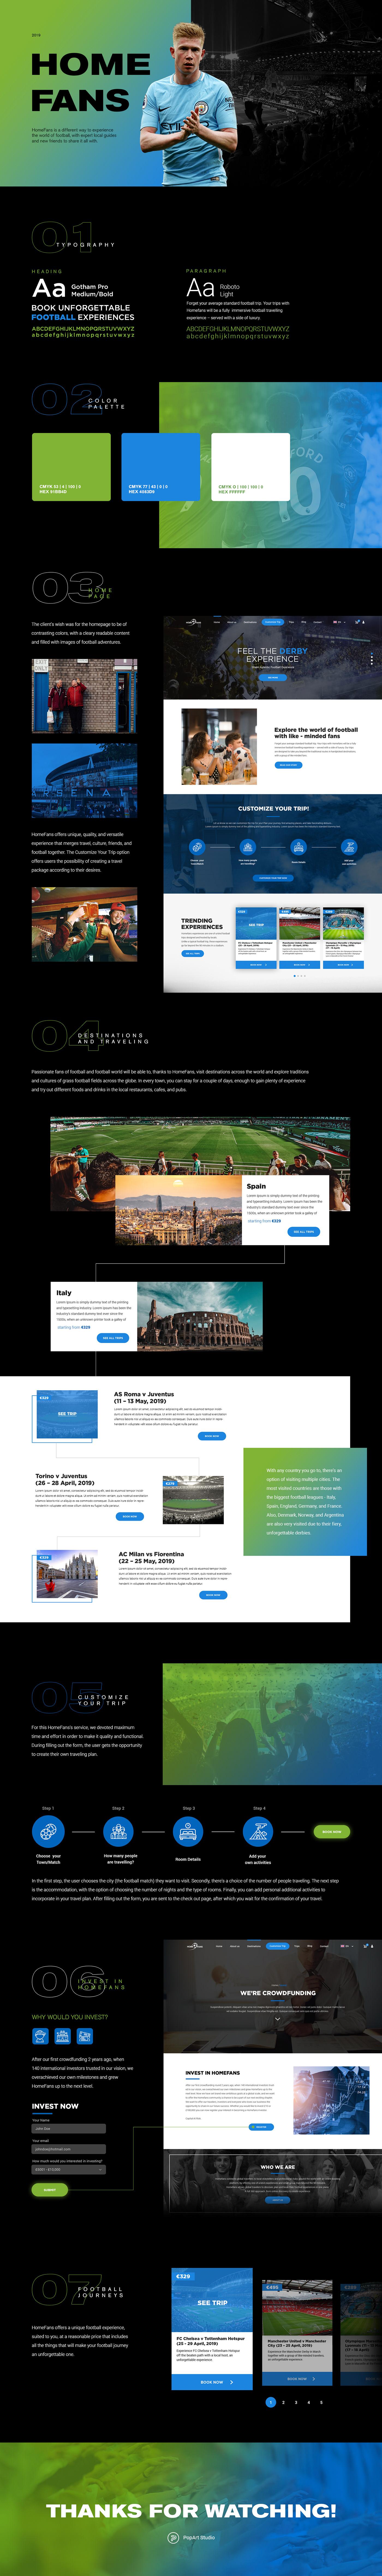 destination fans football soccer Travel UI UserExperience UserInterface Webdesign Website